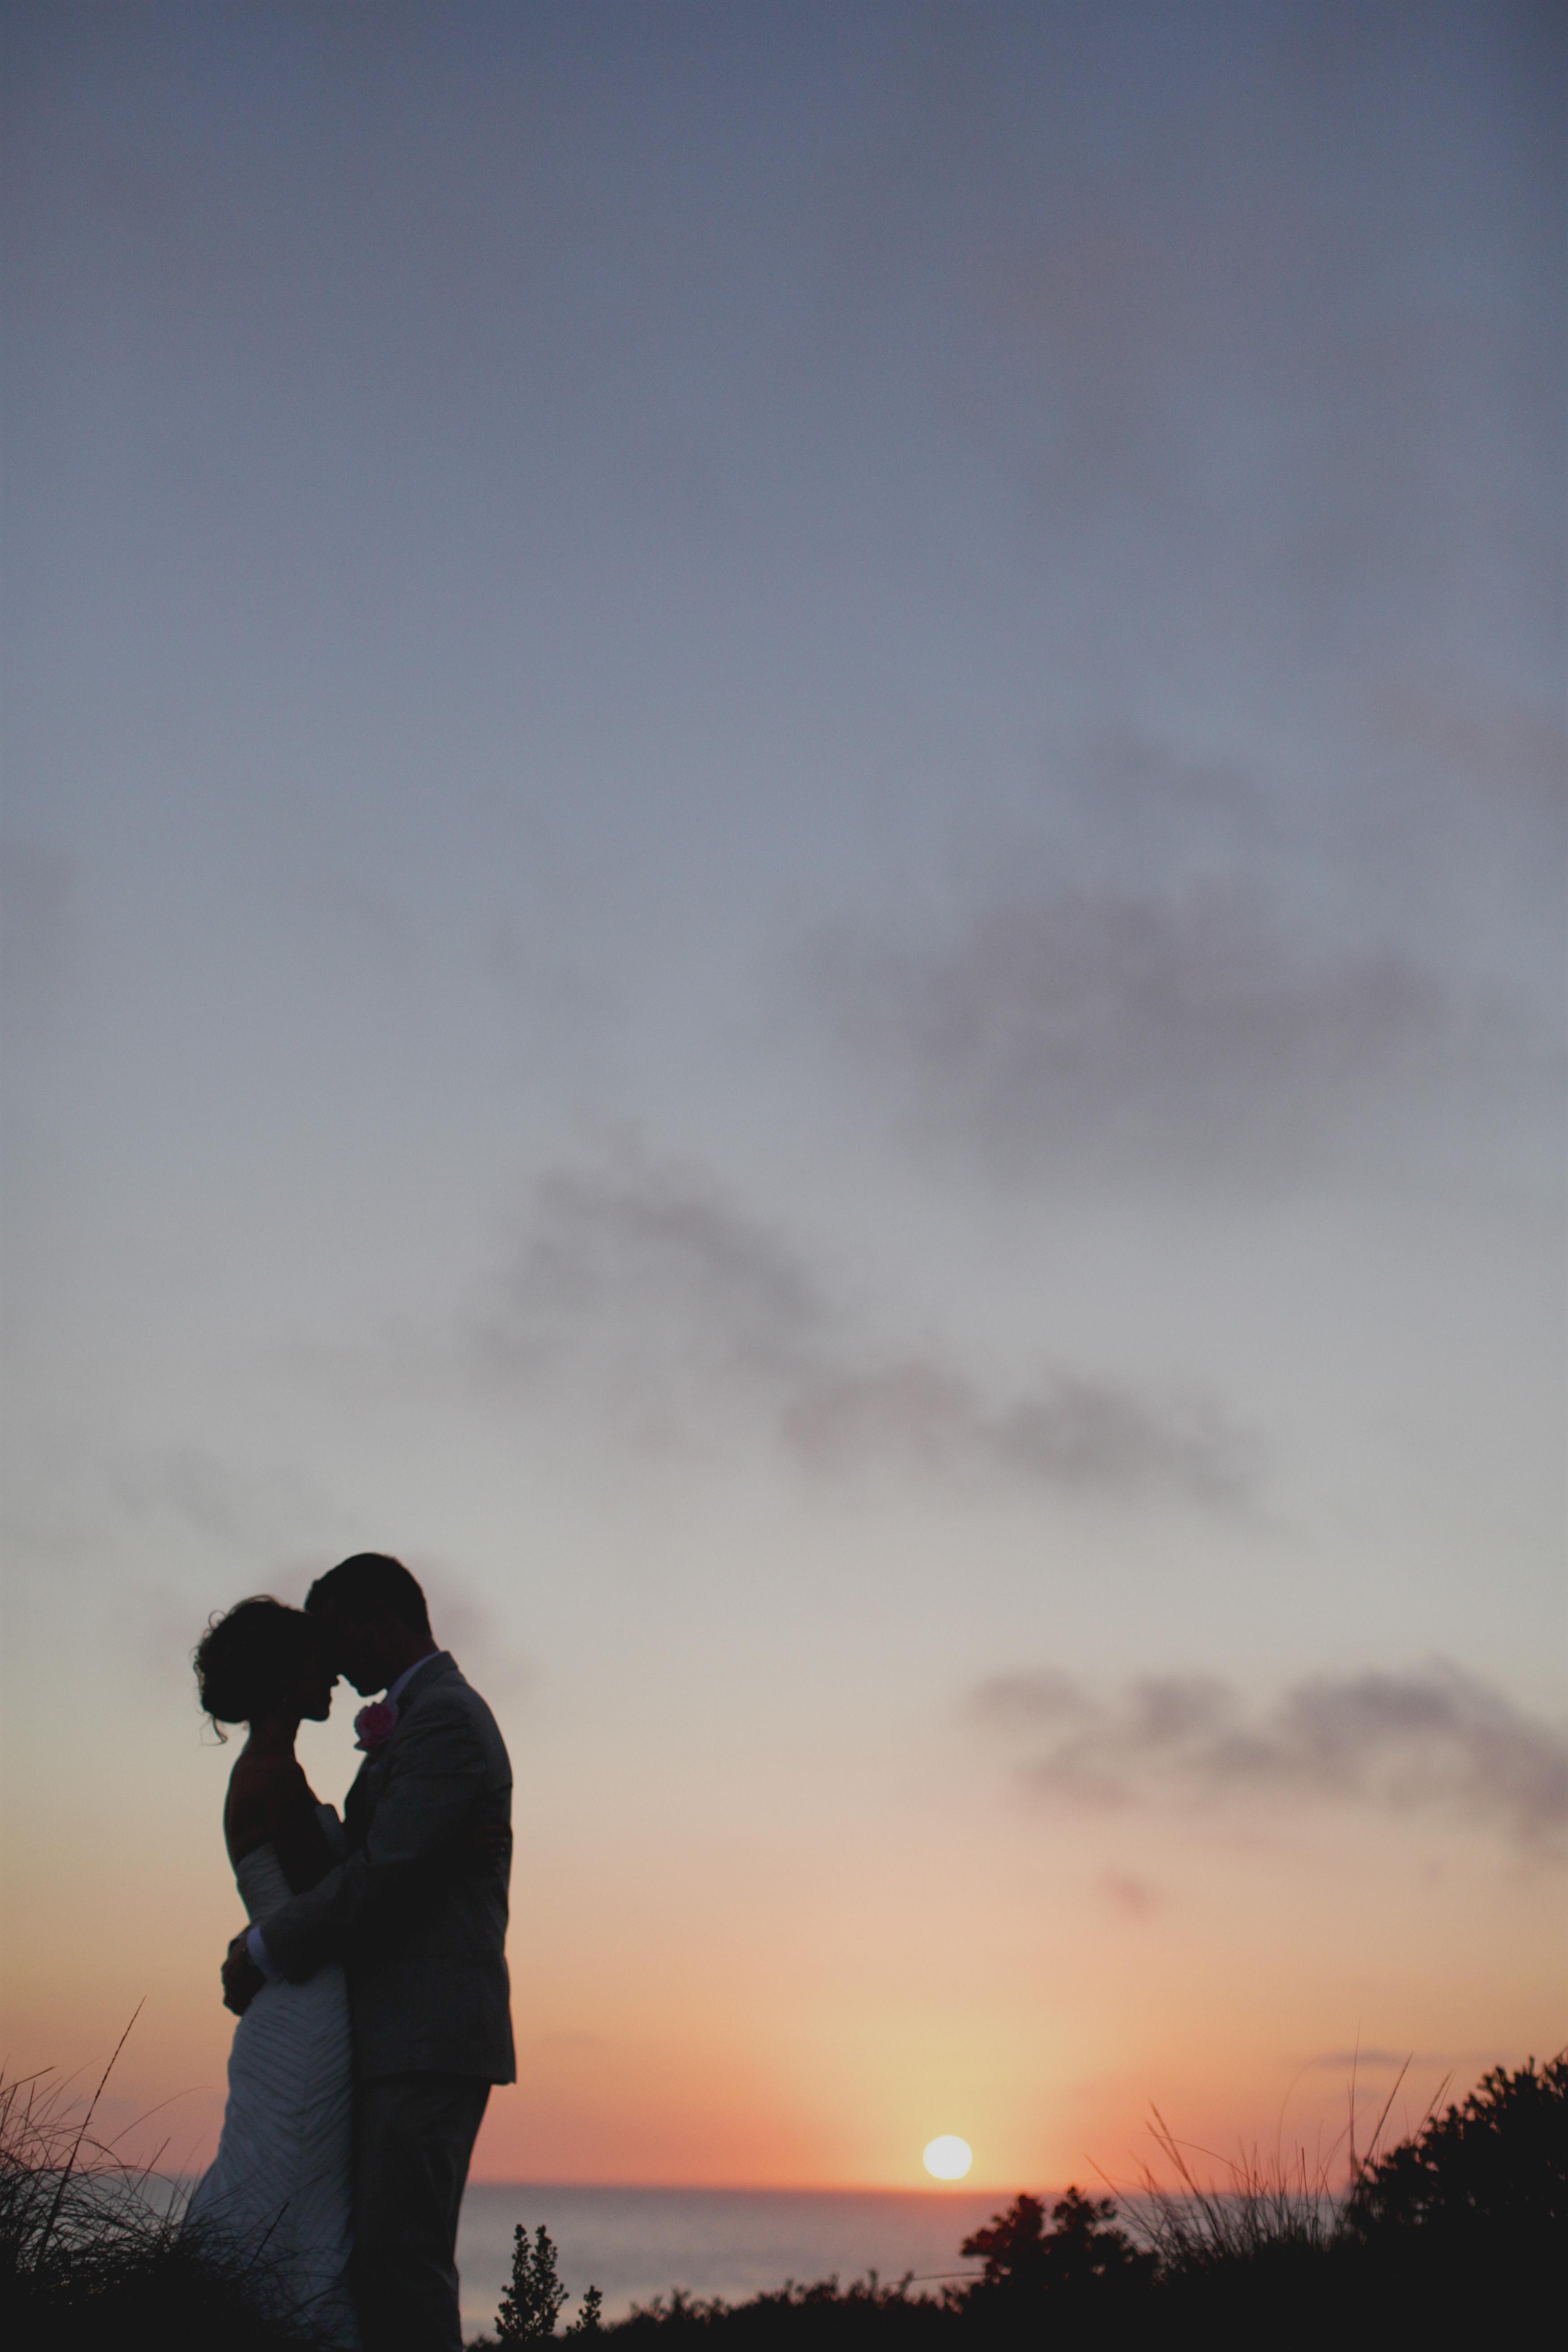 Casa Romantica Wedding Planner, Brandon Kidd Photography, A Good Affair Wedding & Event Production